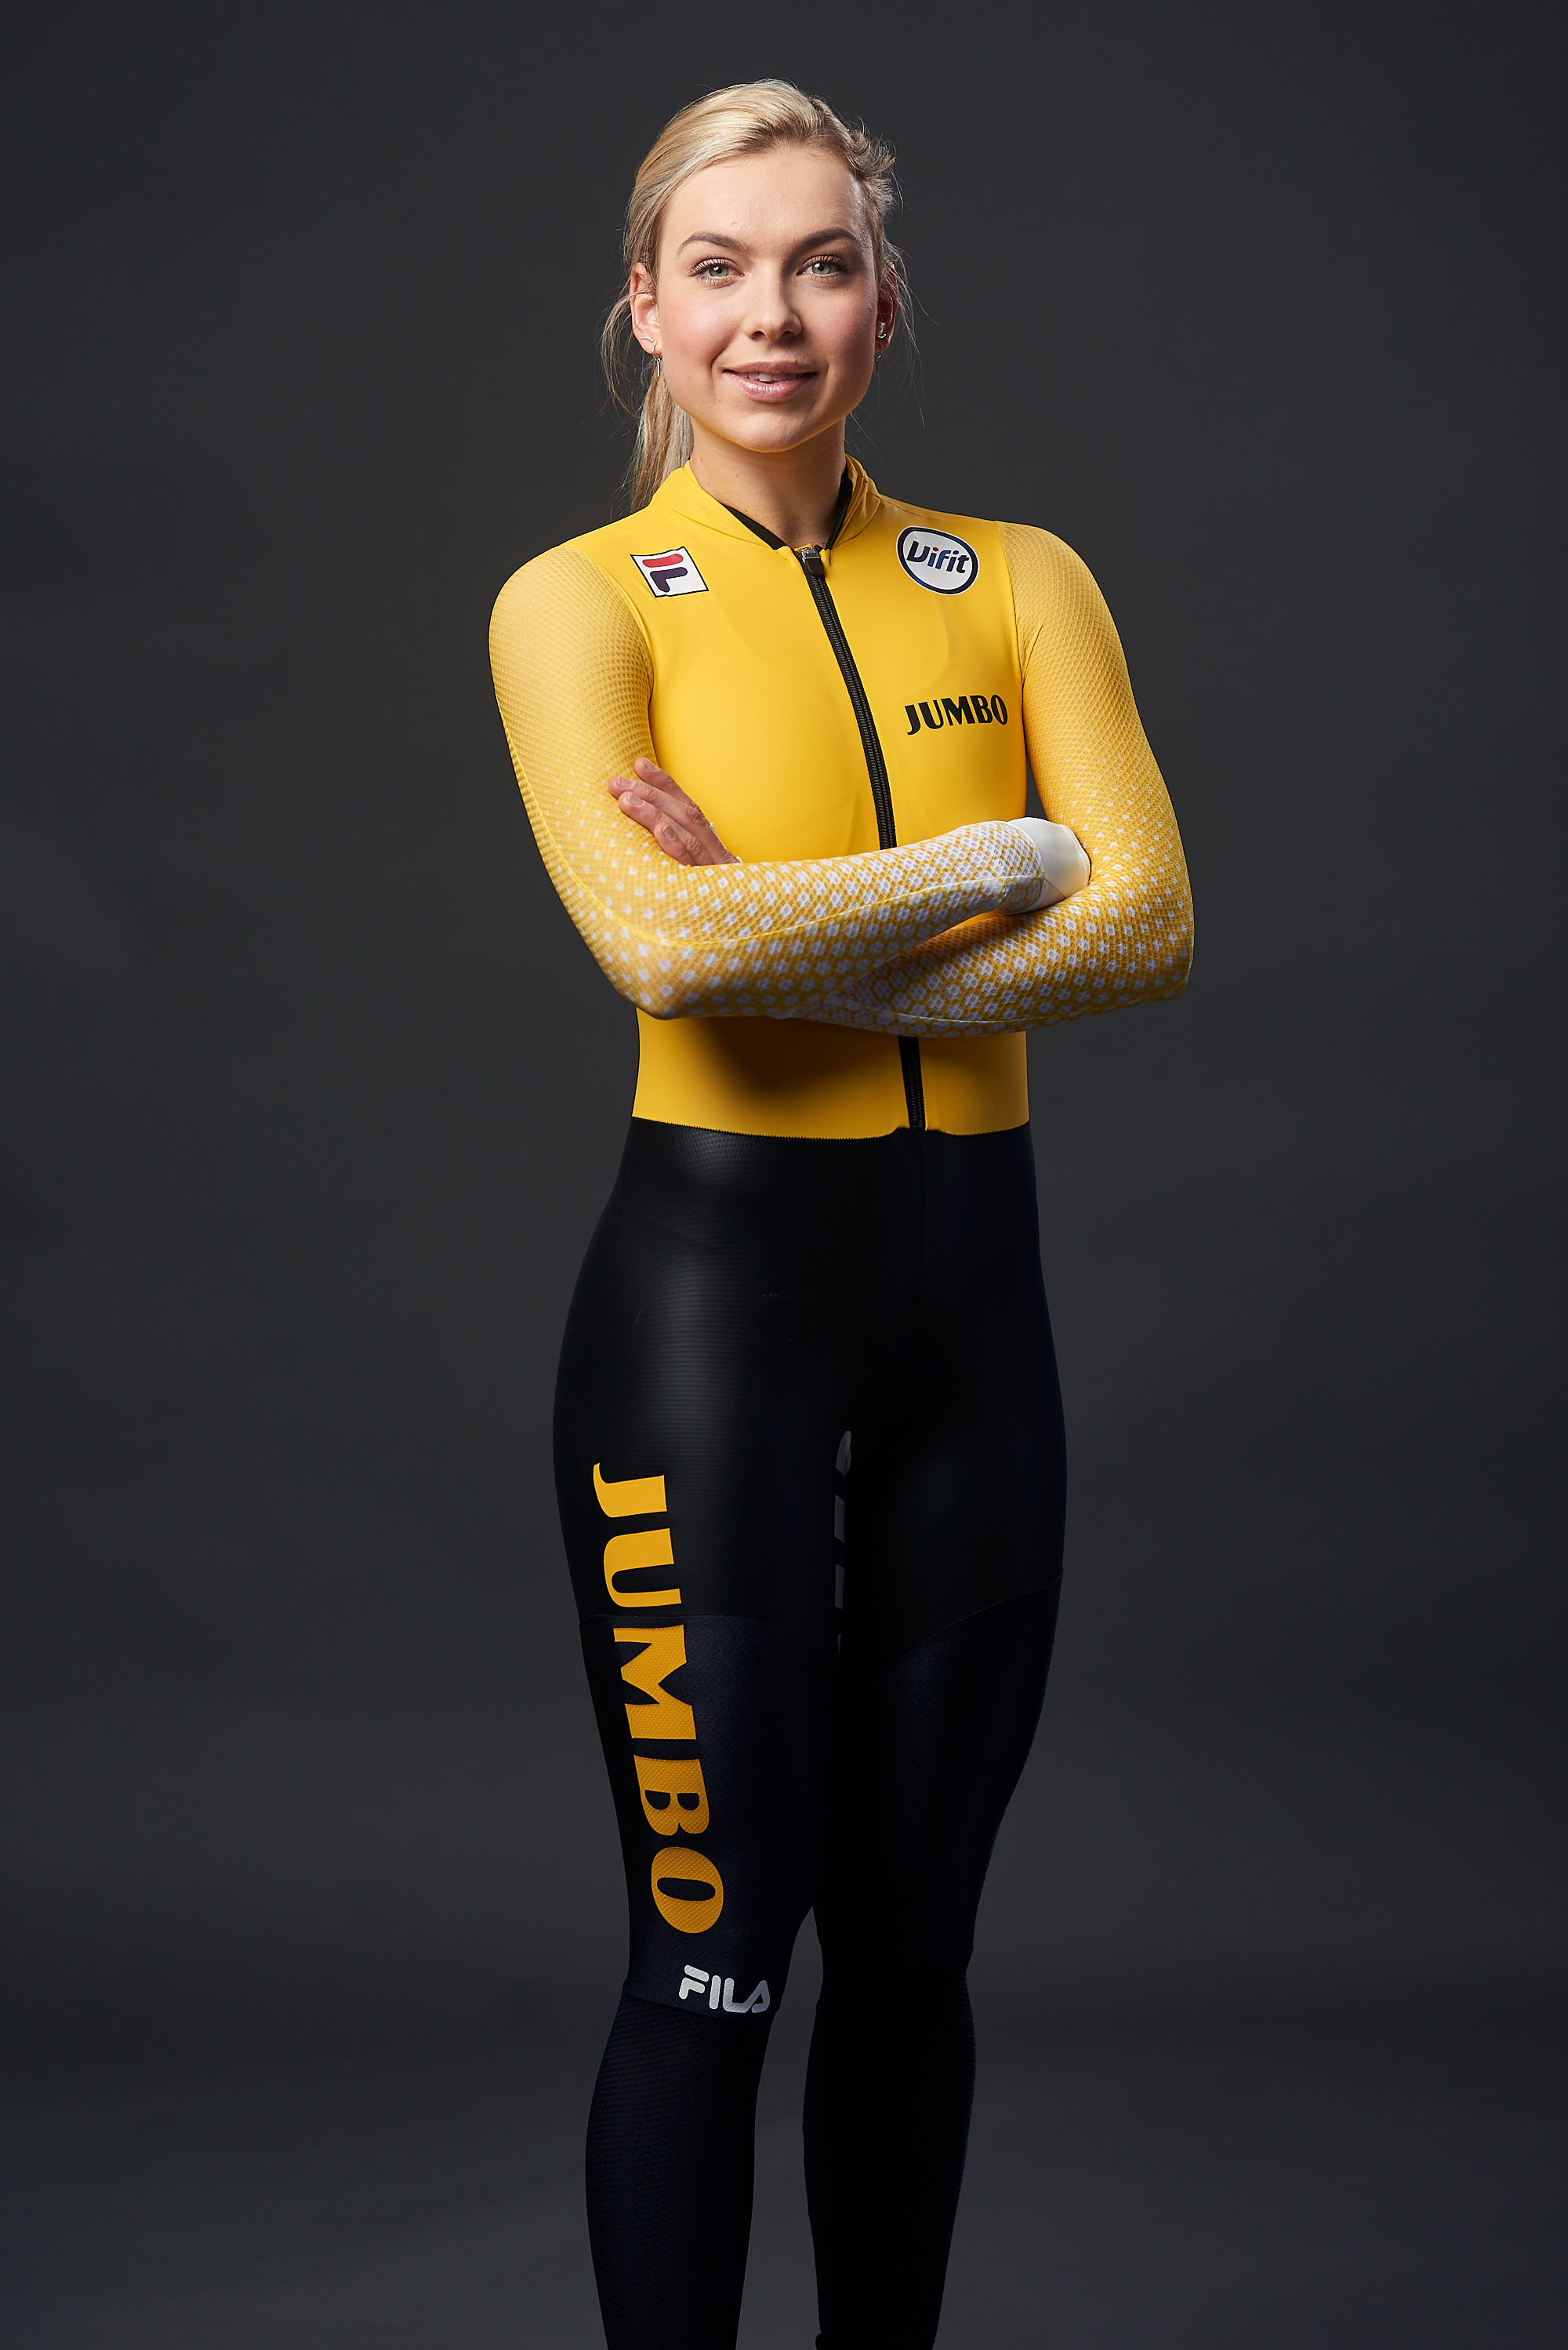 Portrait of Jumbo-Visma's ice skating team's Joy Beune